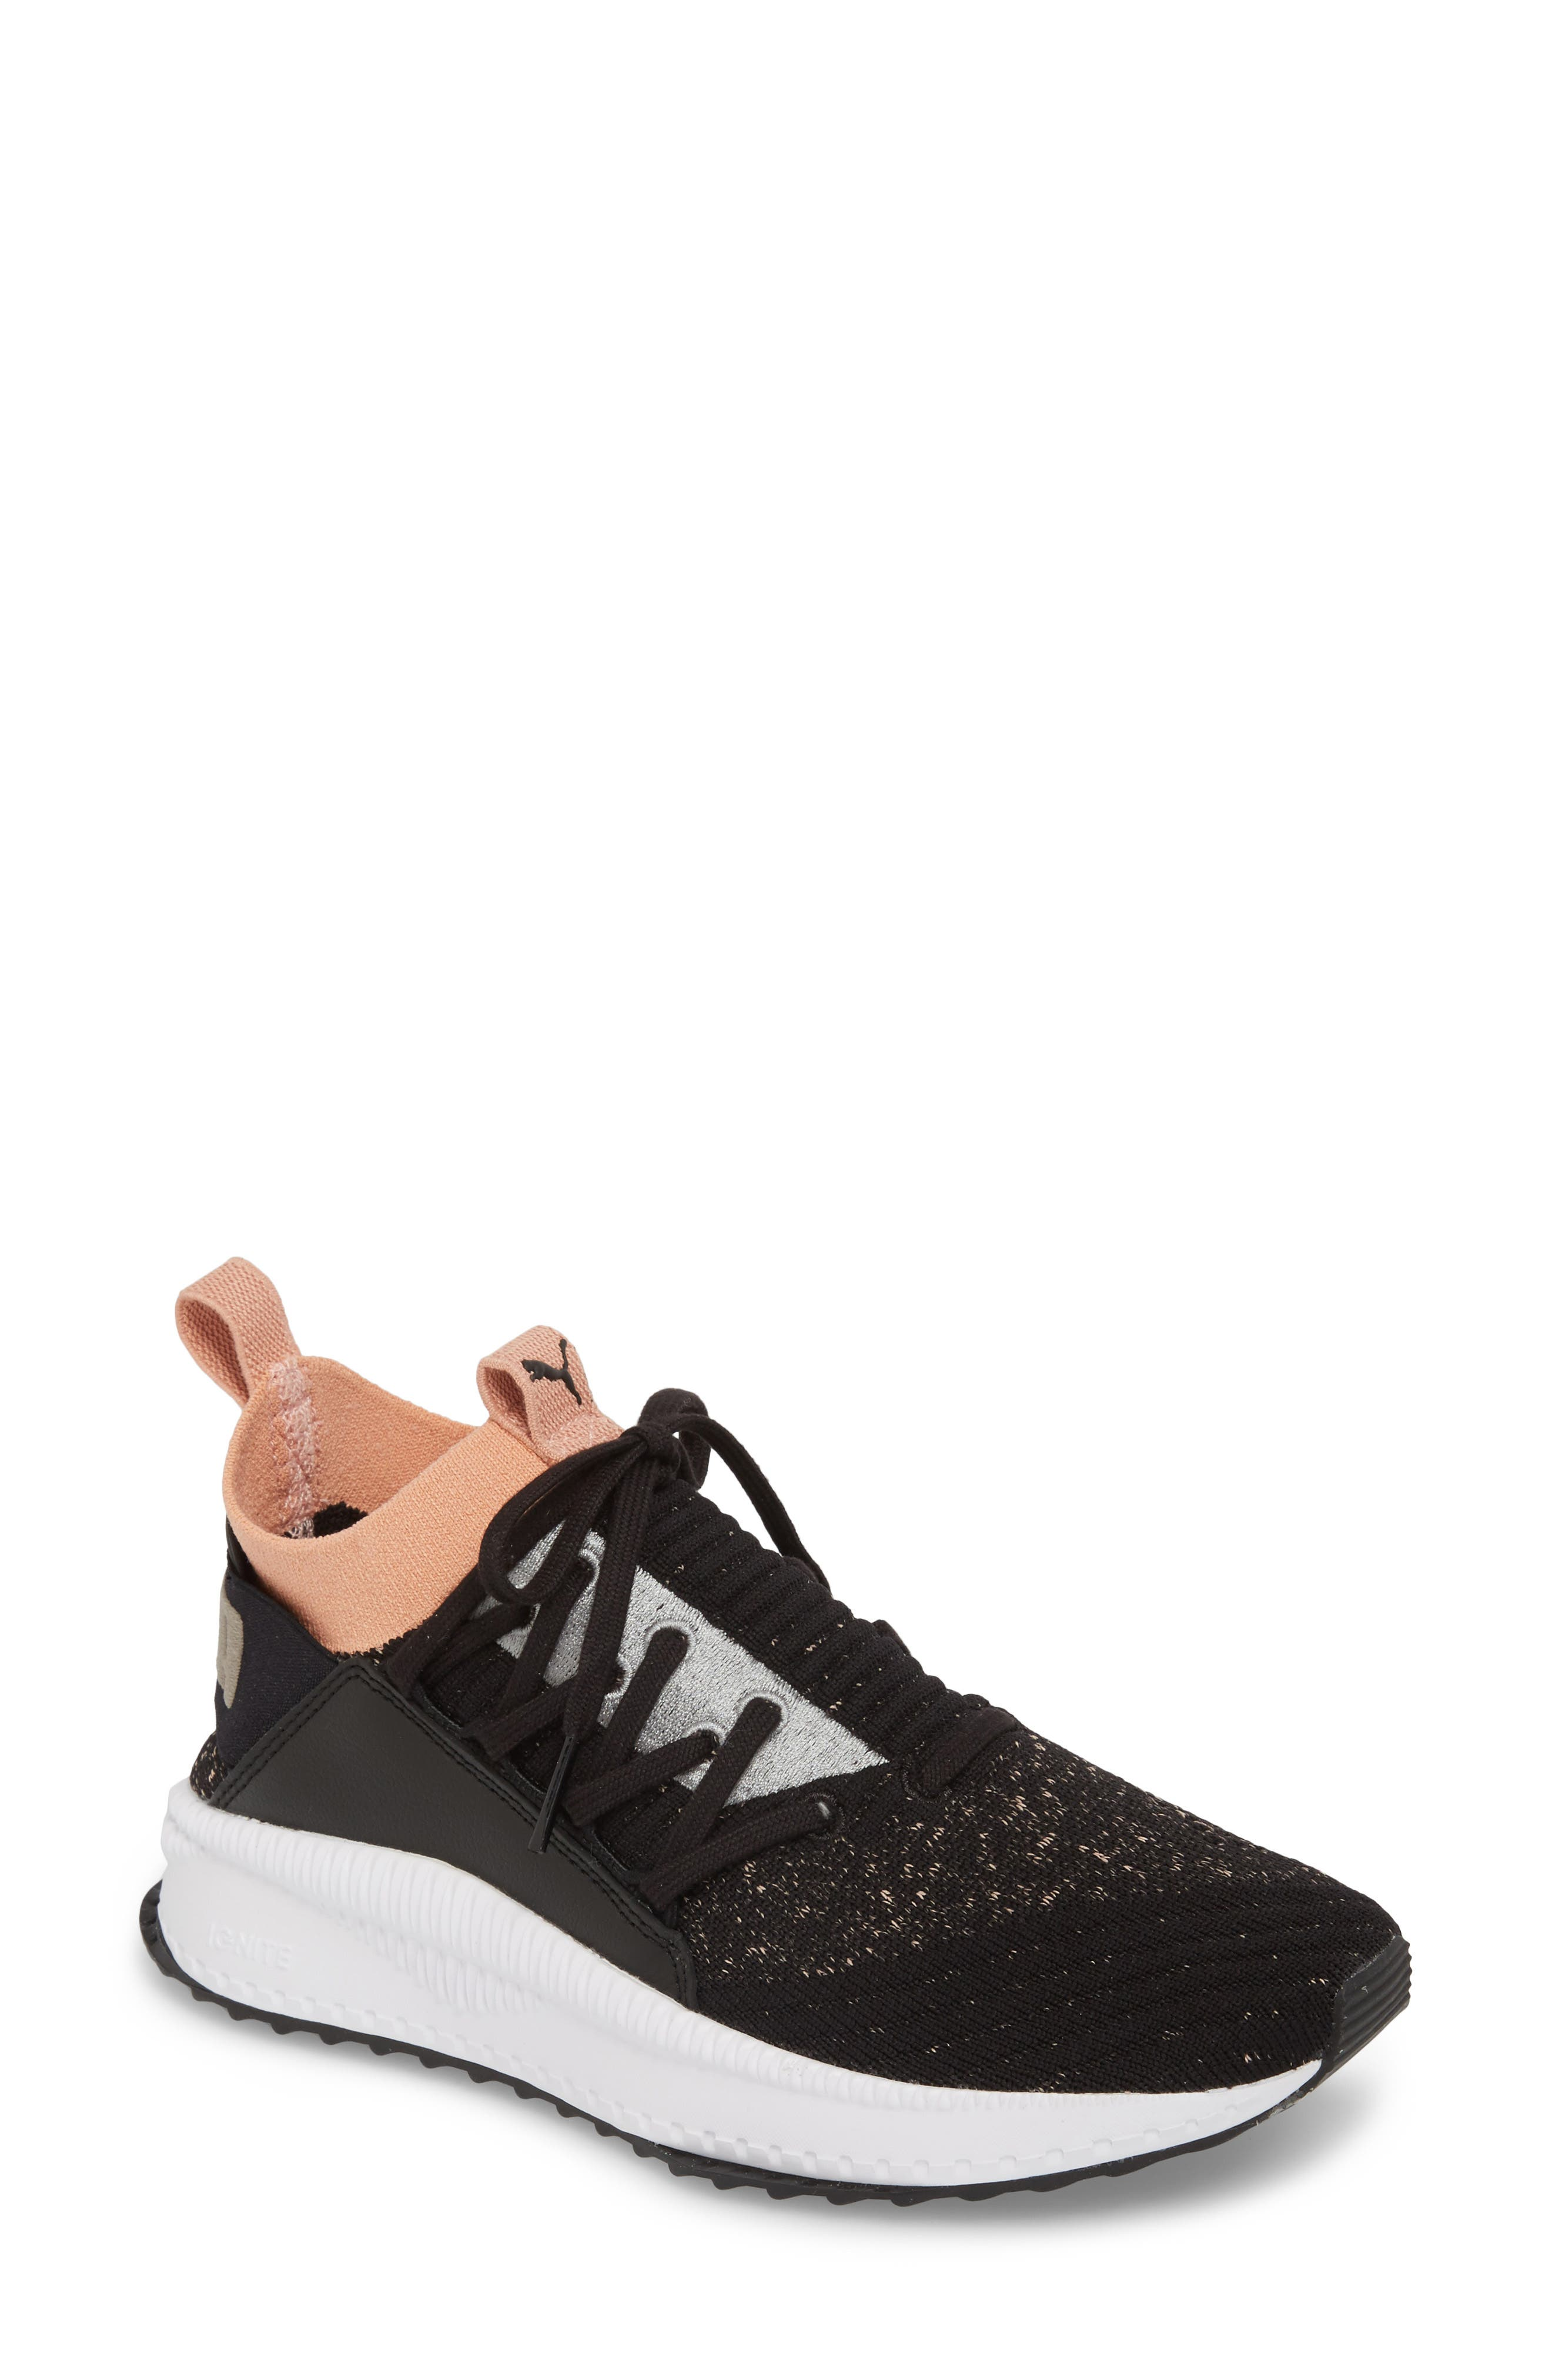 Tsugi Jun Knit Sneaker,                         Main,                         color, 001